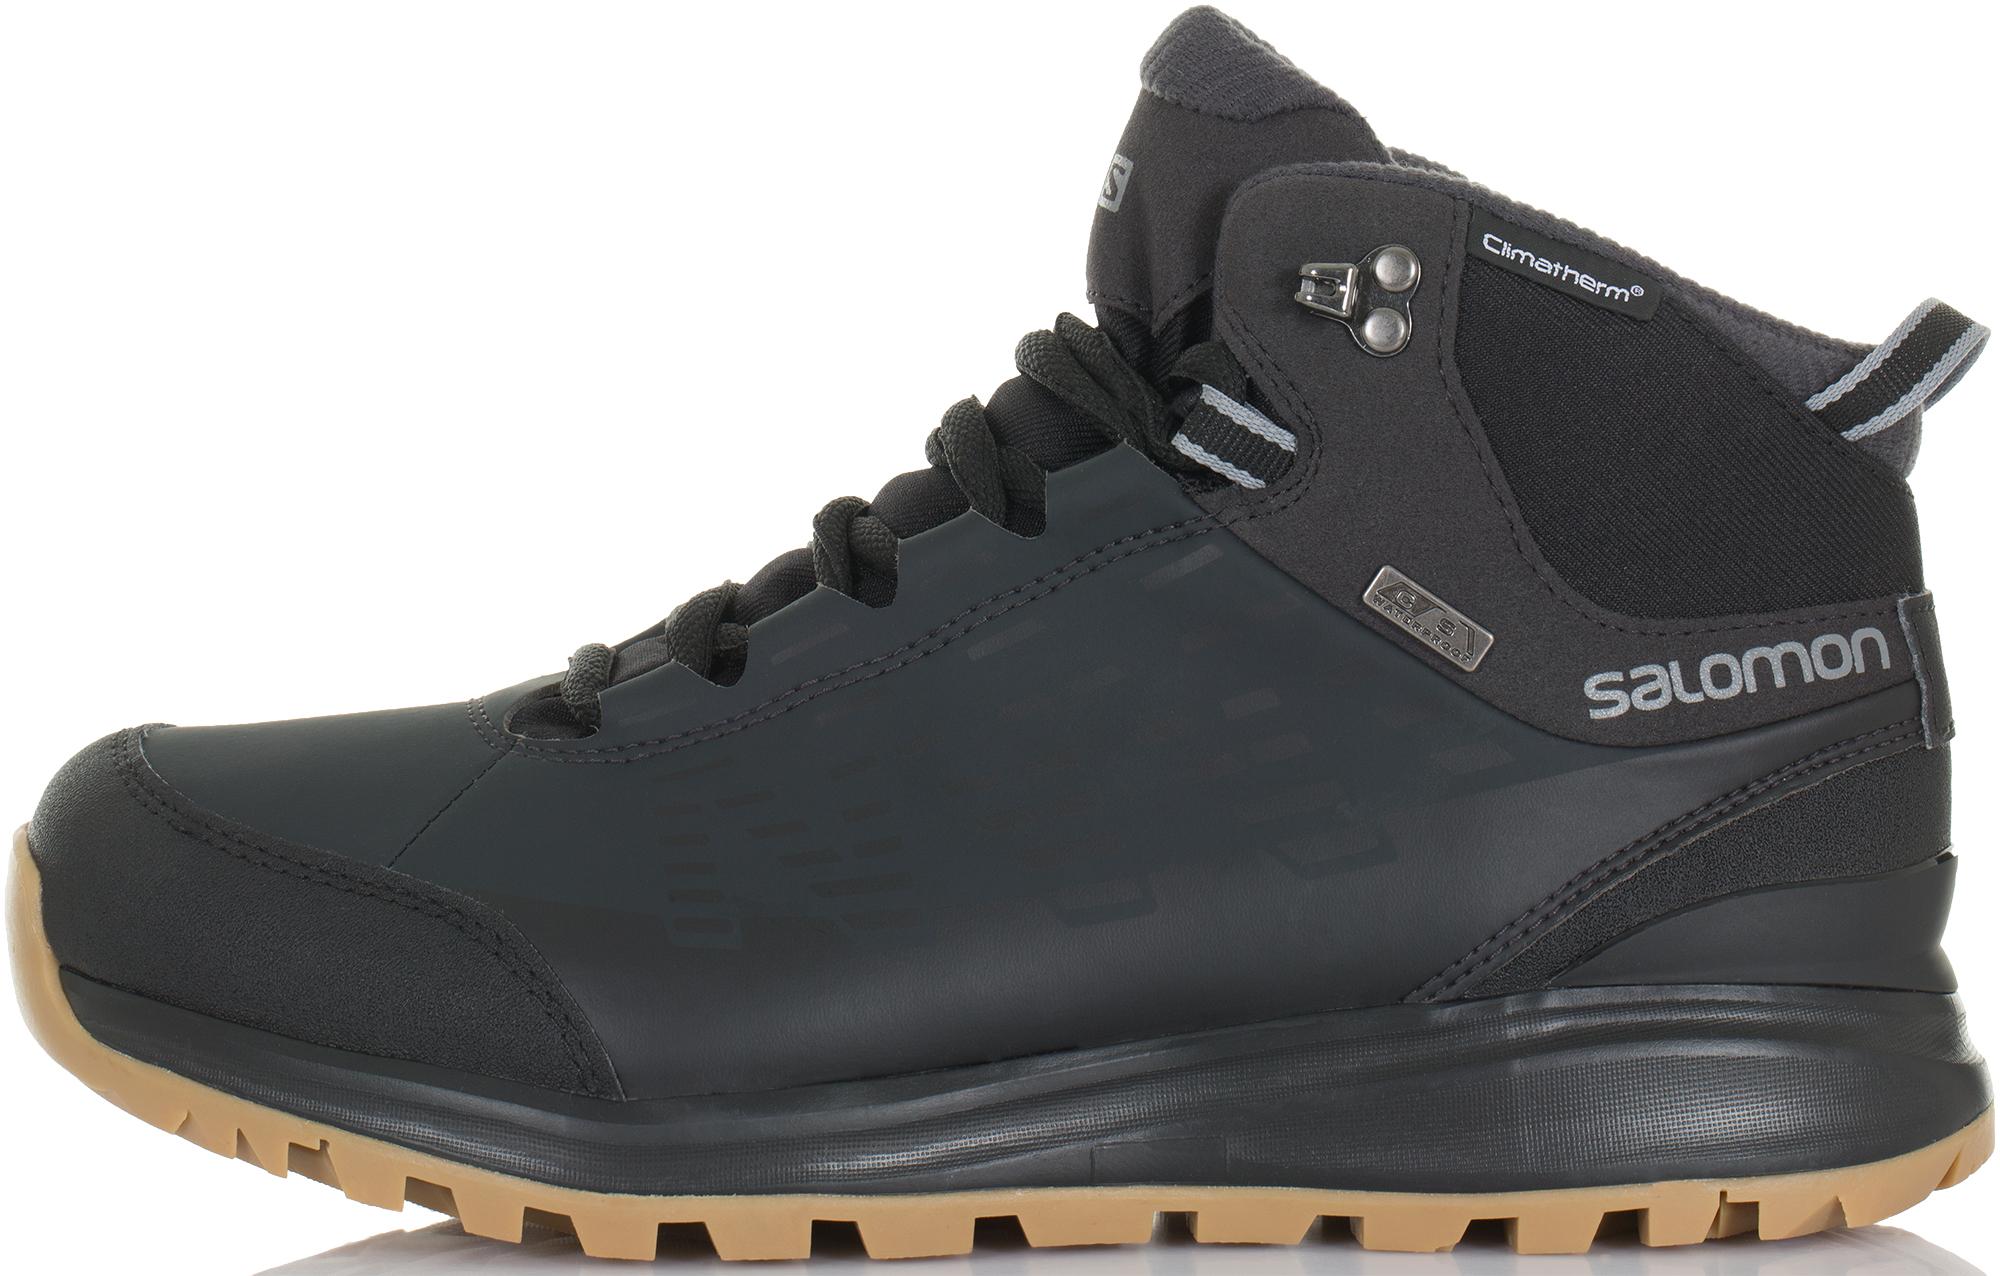 Salomon Ботинки утепленные мужские Salomon Kaipo, размер 41 salomon ботинки утепленные мужские salomon crusano размер 40